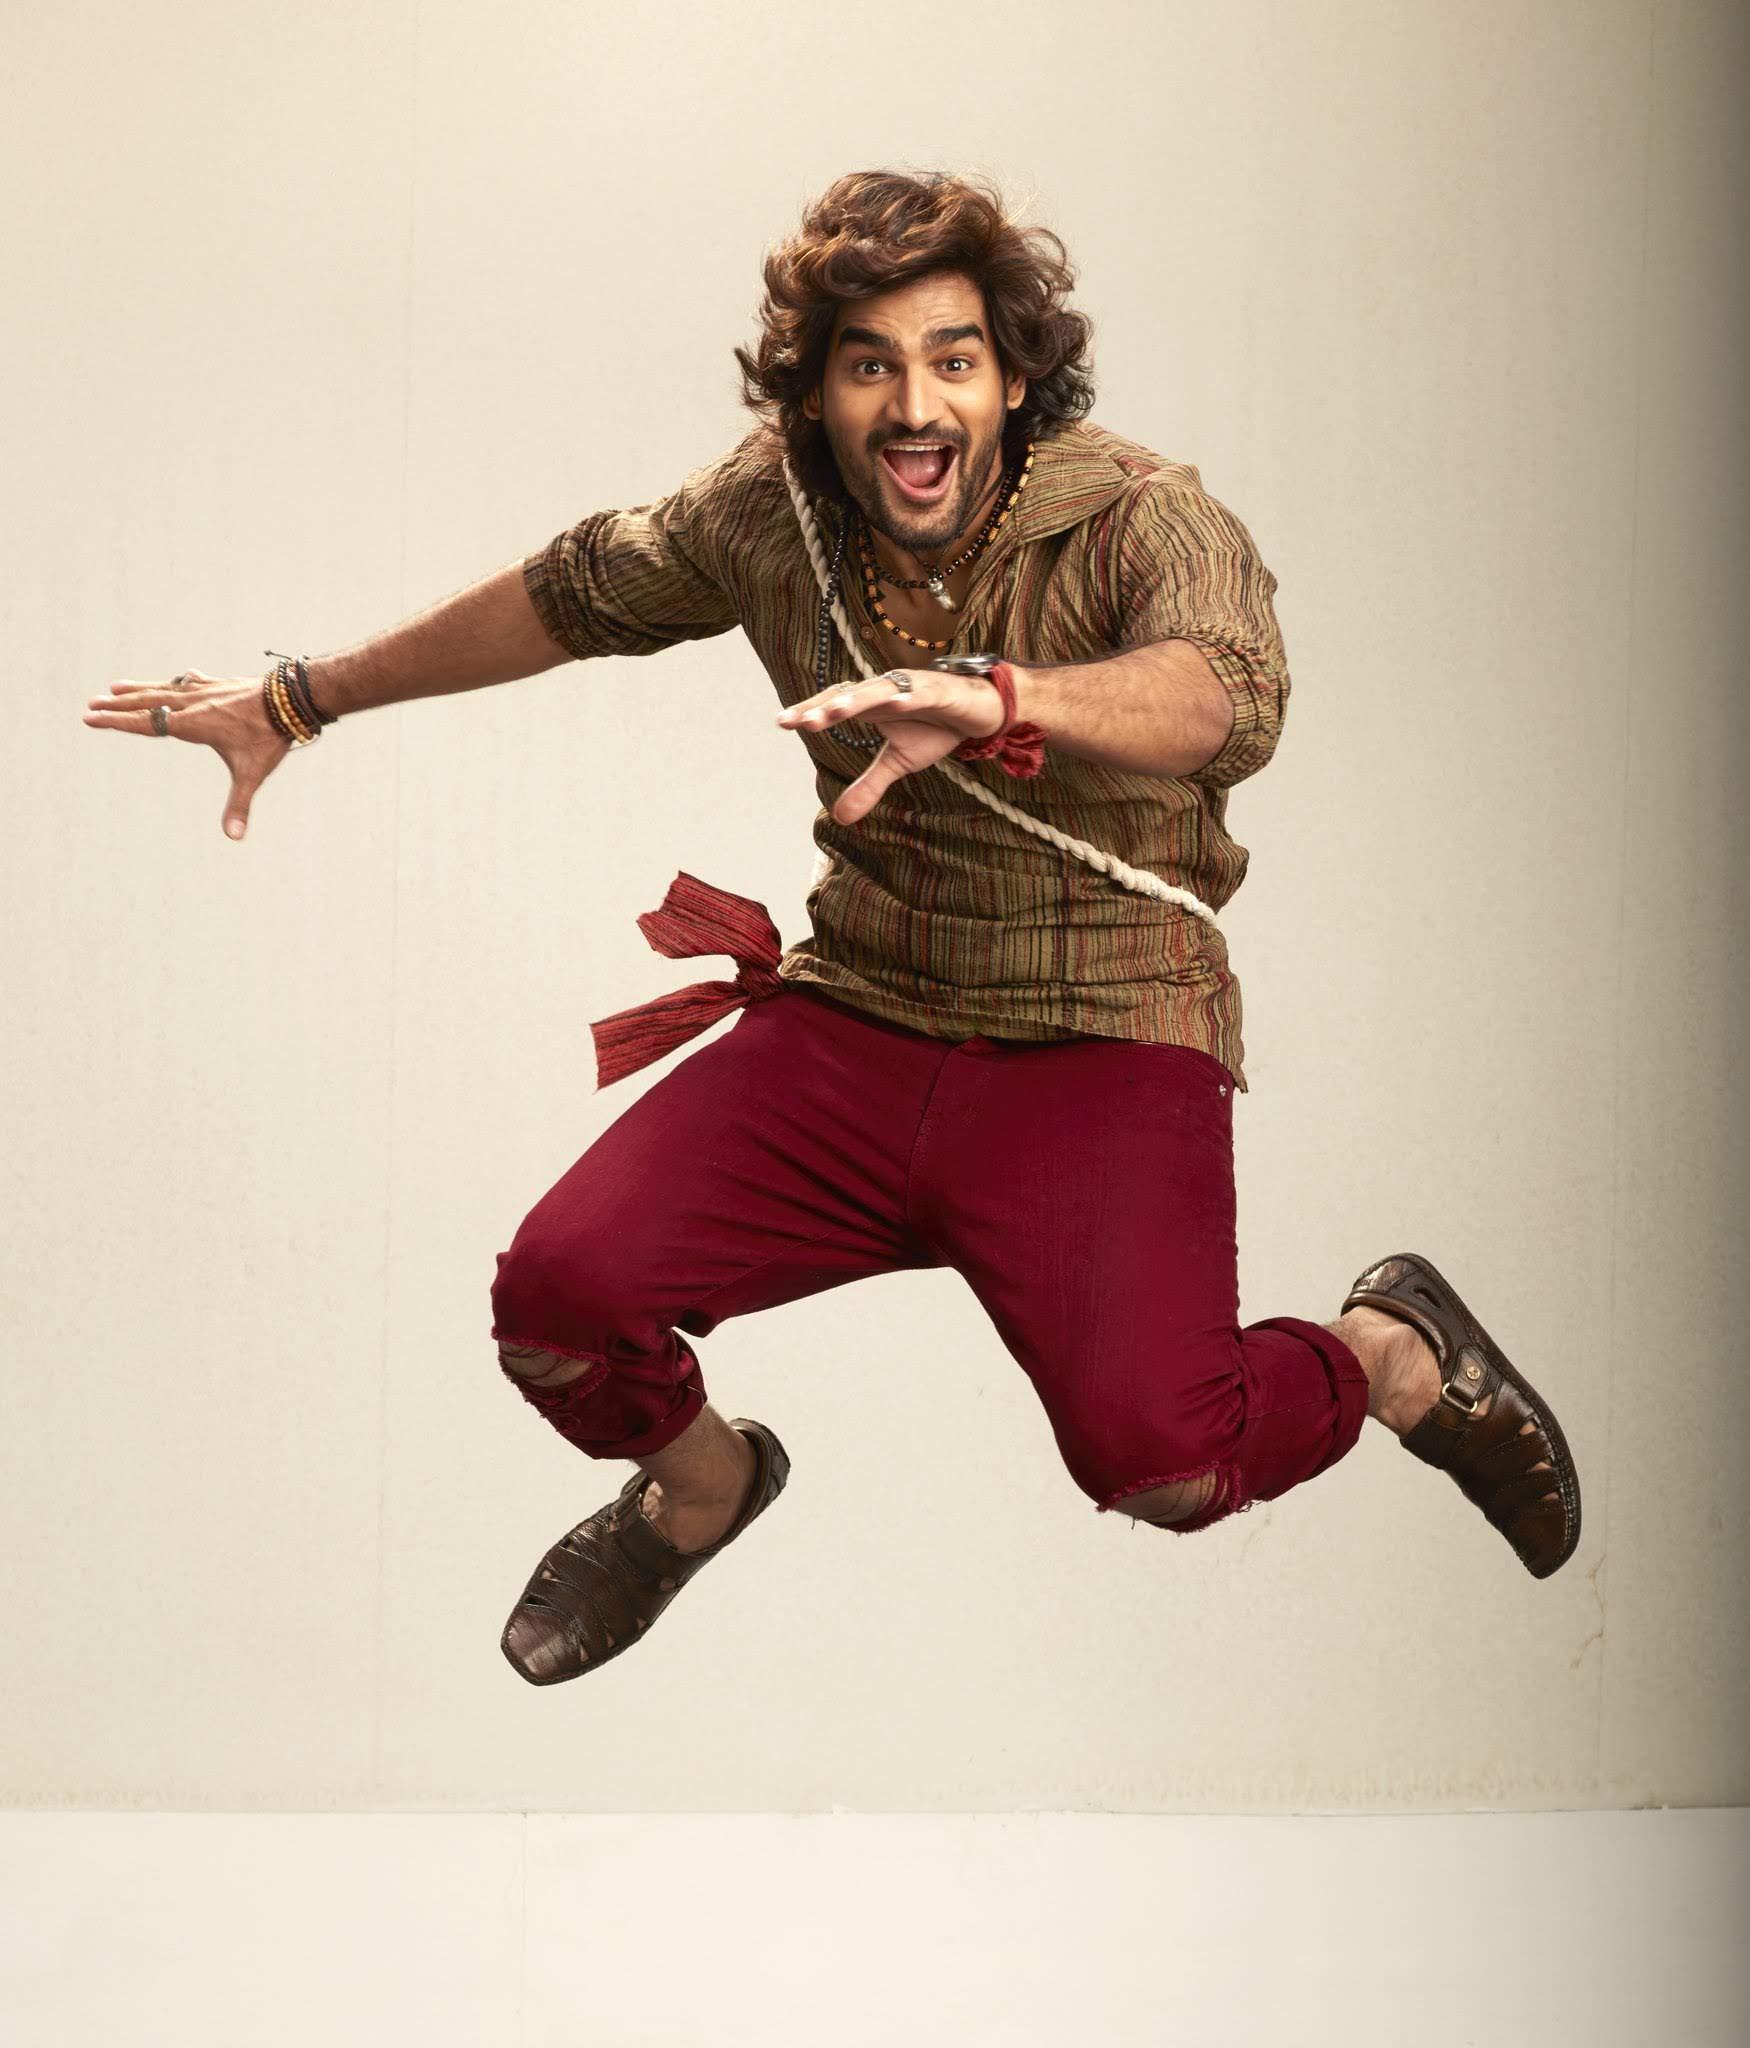 kartikeya-gummakonda-90ml-fame-actor-48